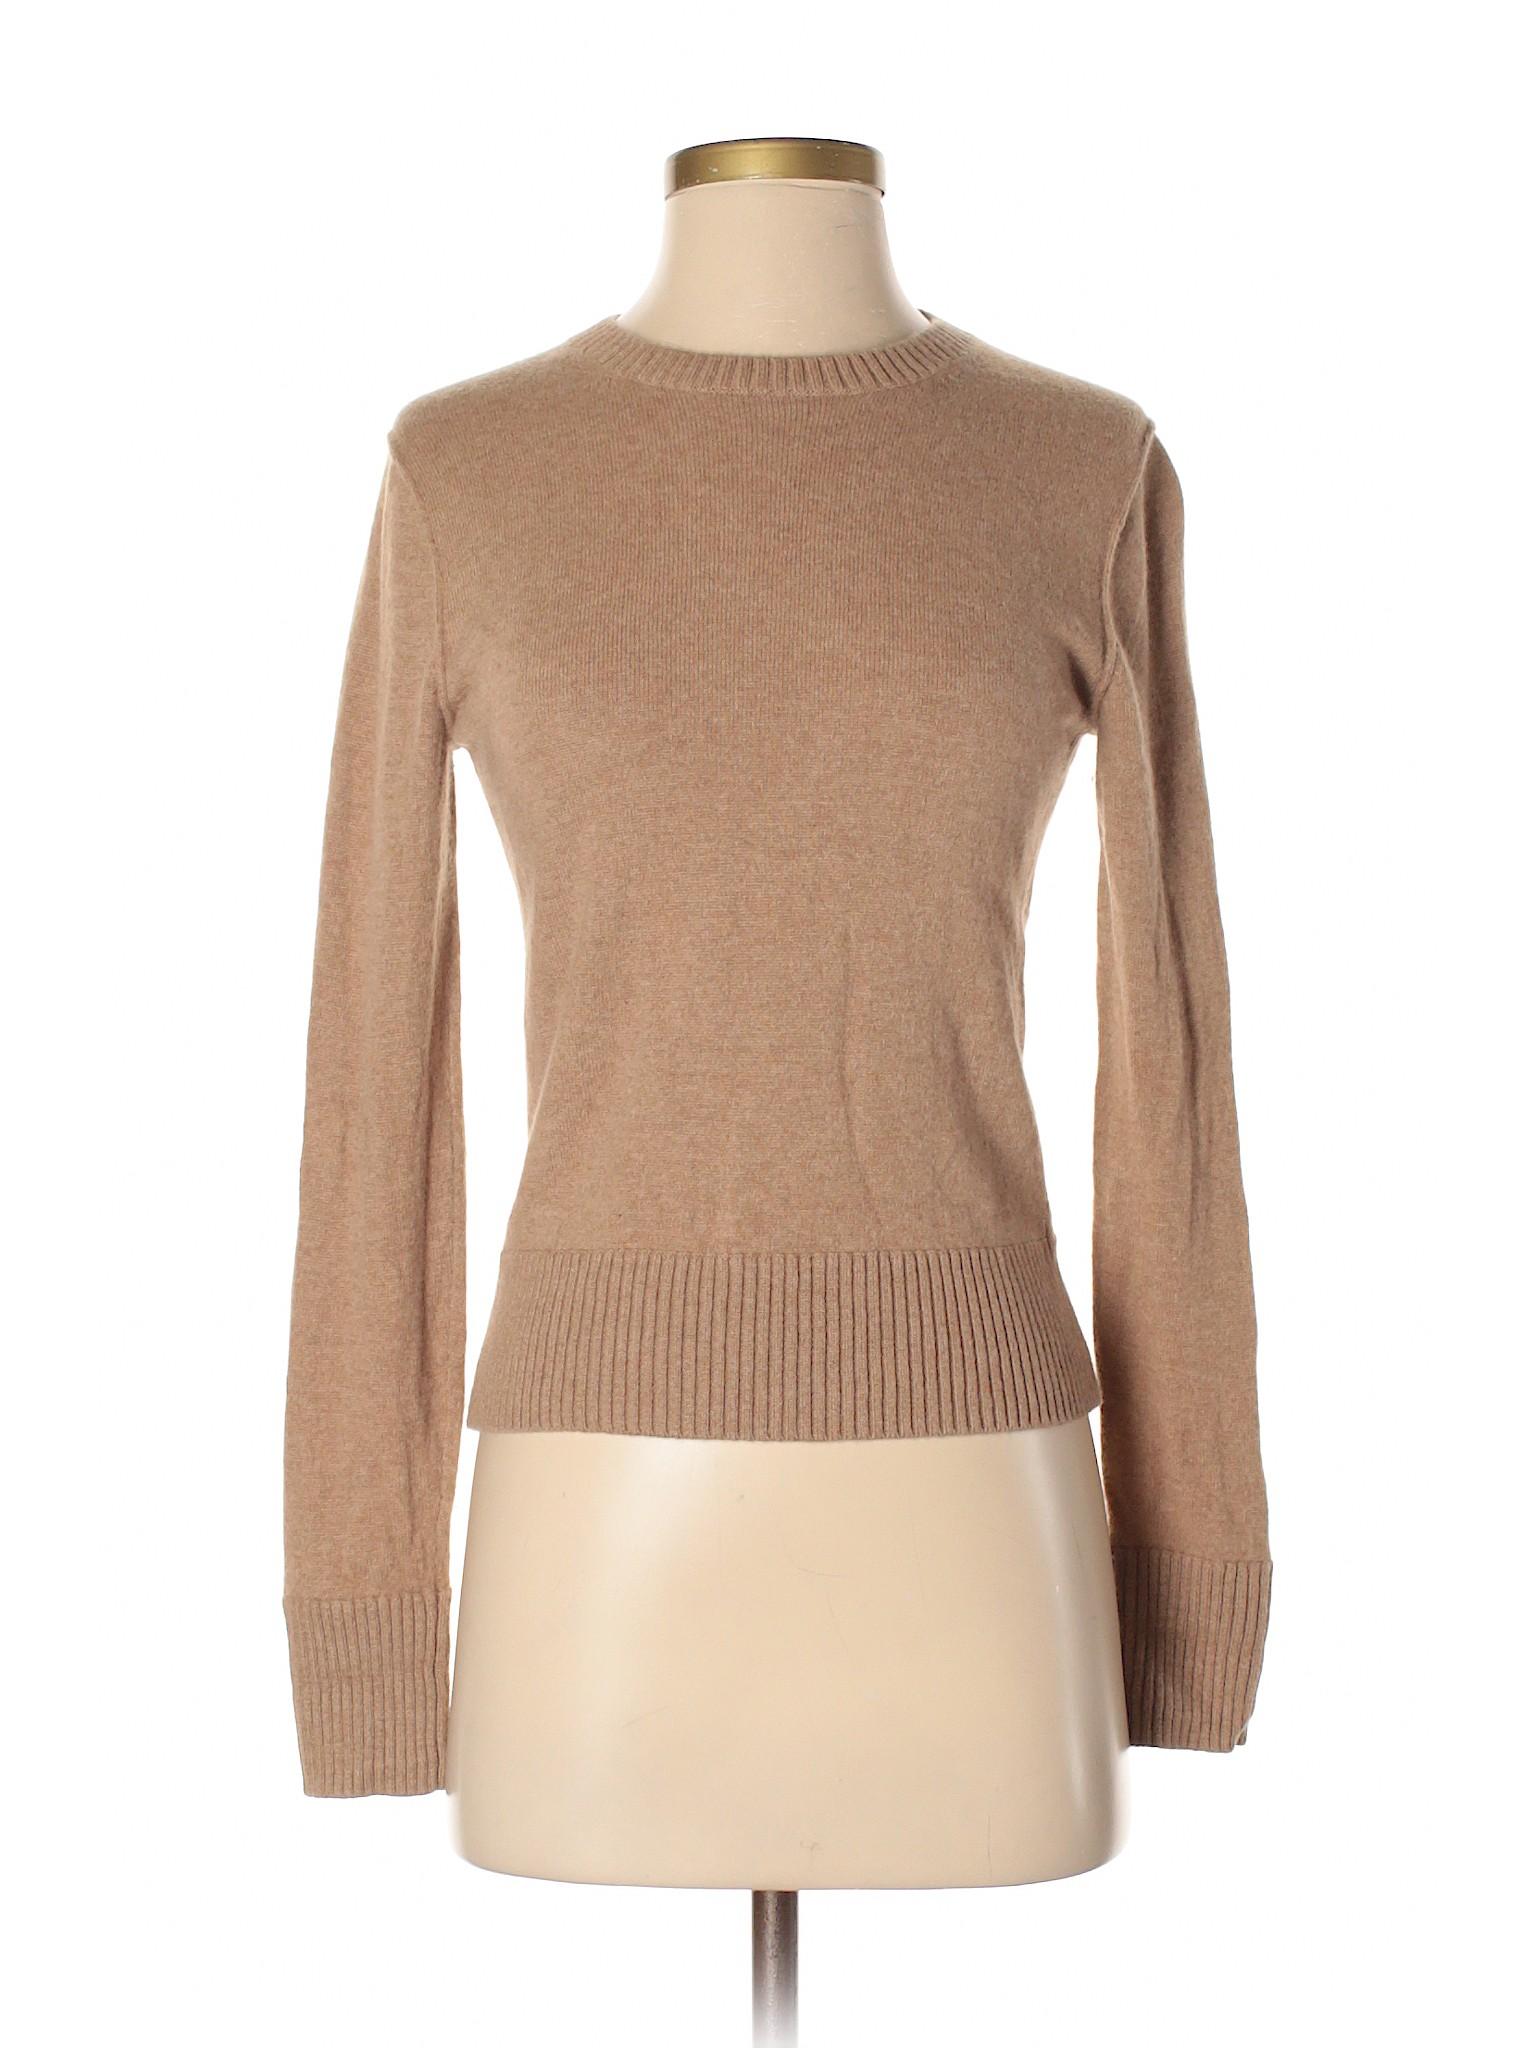 Cashmere Pullover Sweater Club Monaco Boutique Winter qwHP6Wnxt